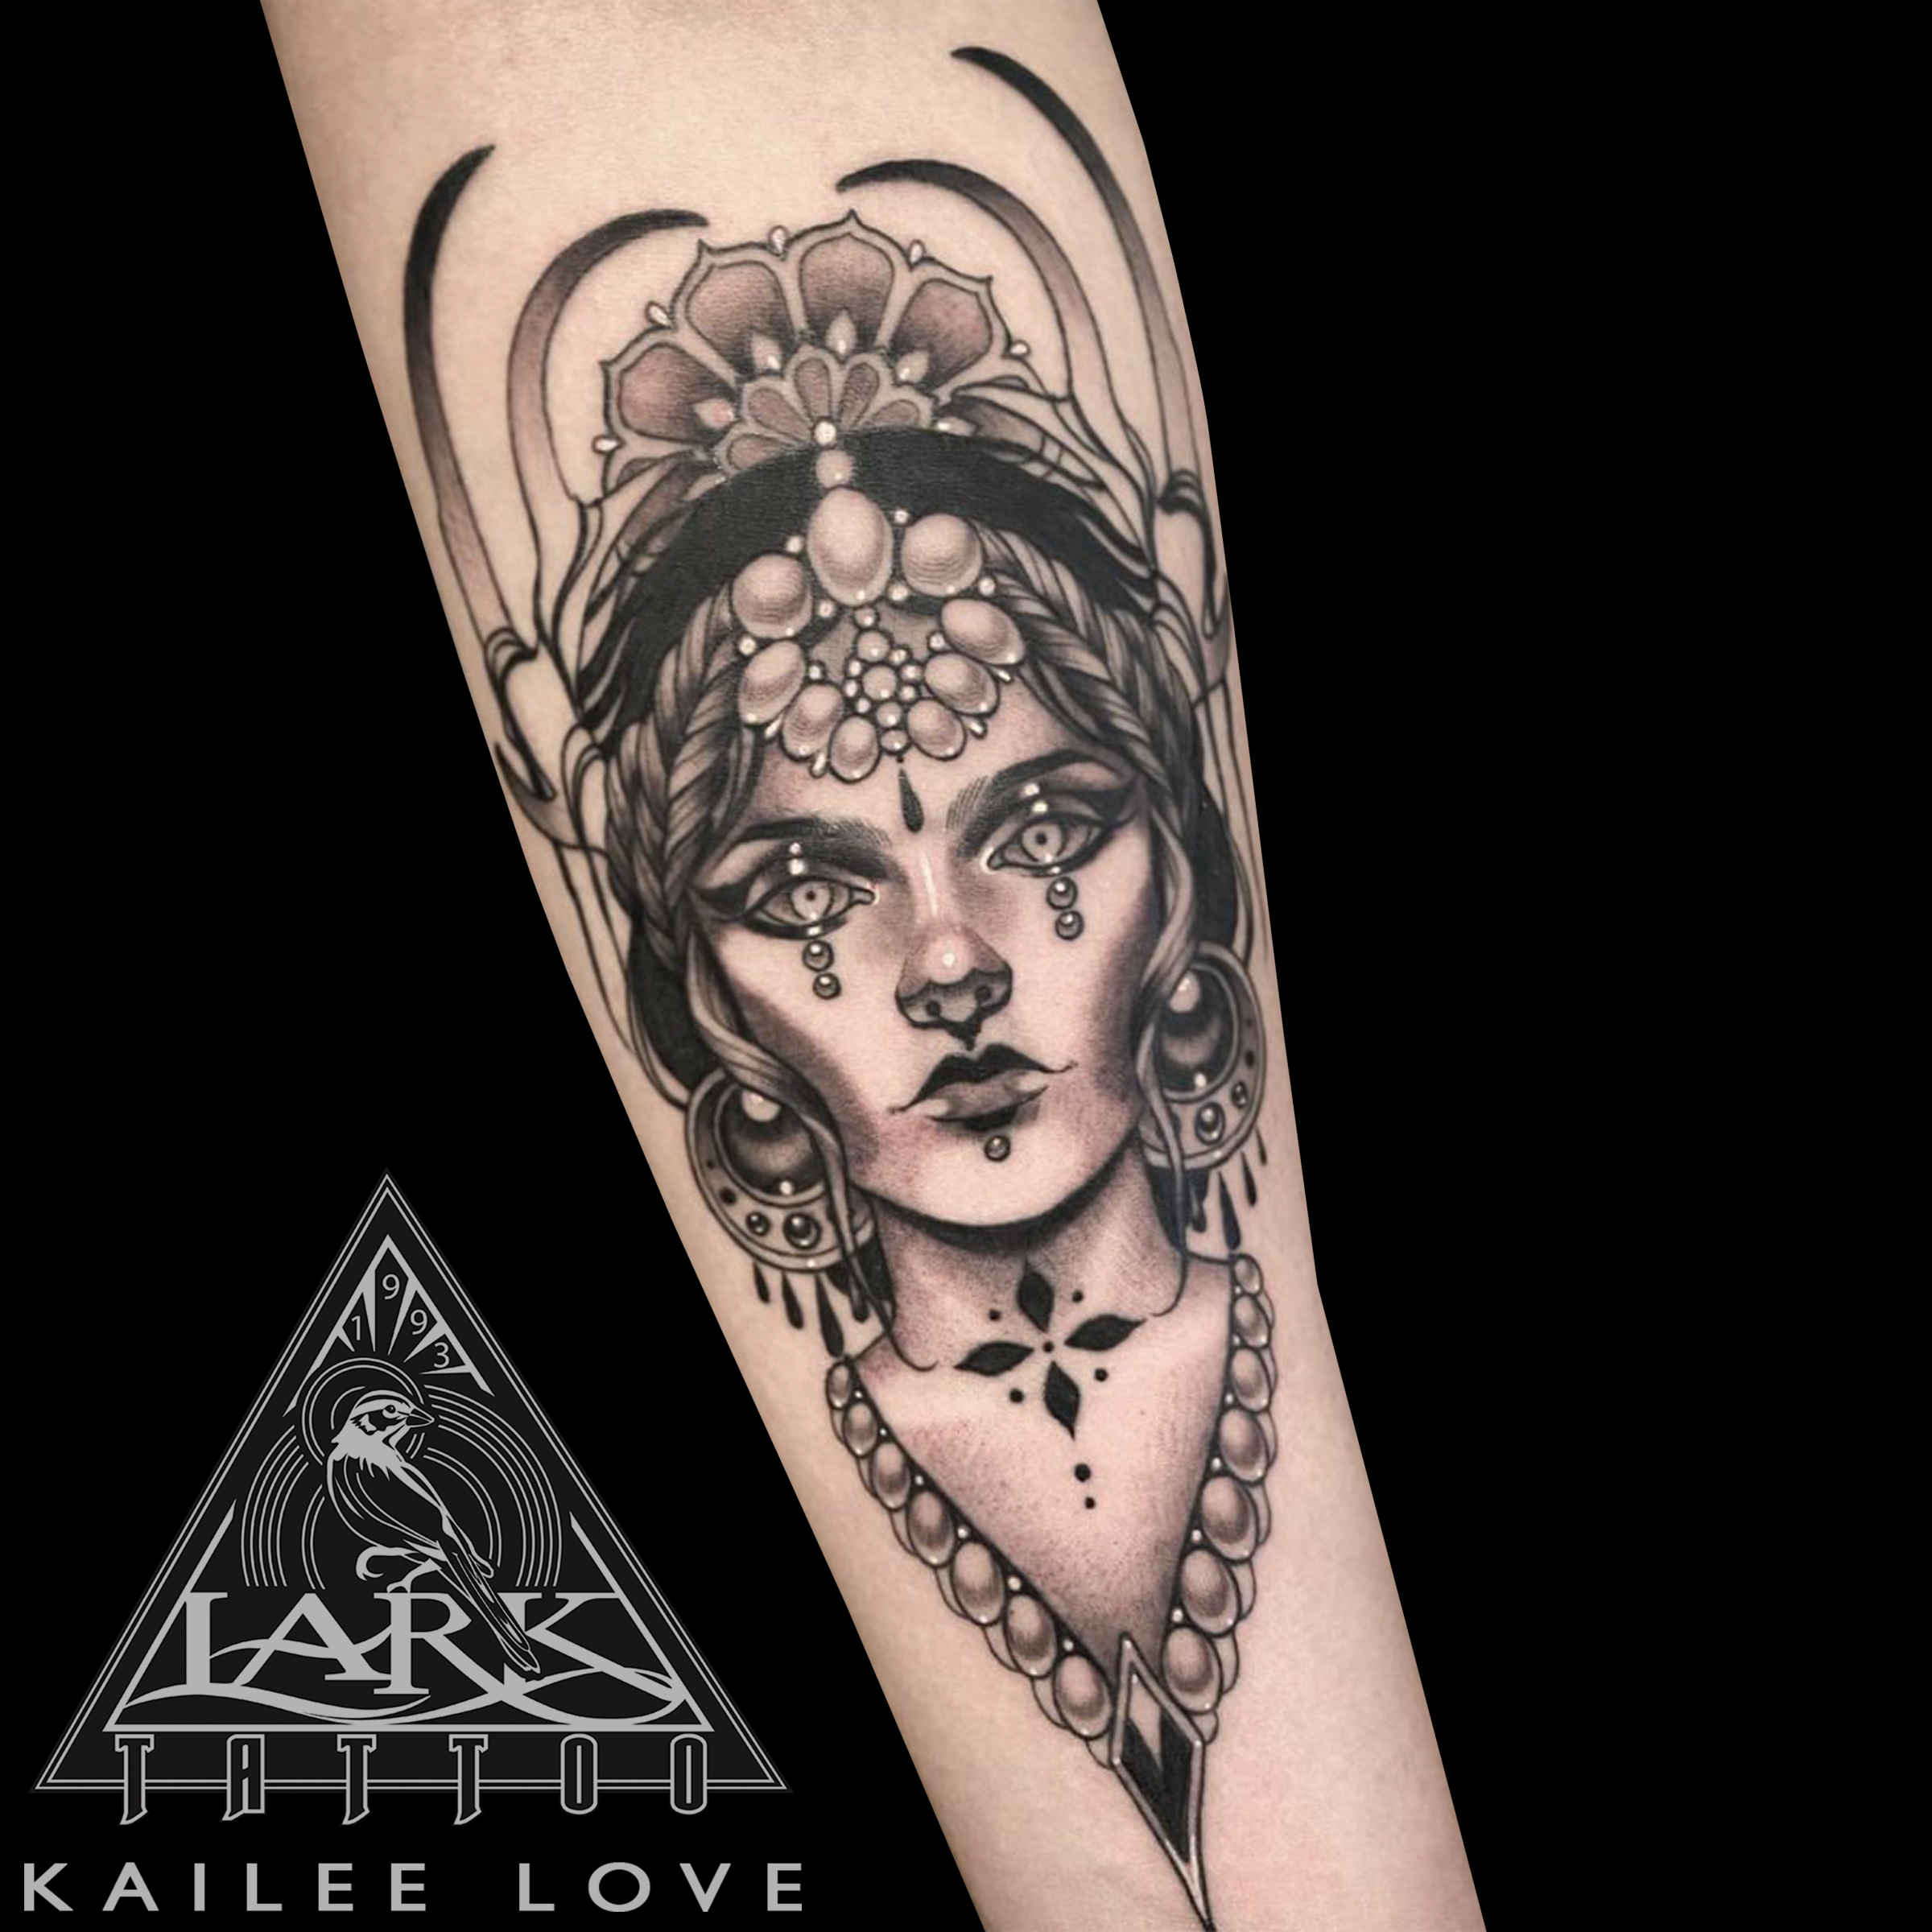 #LarkTattoo #KaileeLove #KaileeLoveLarkTattoo #Tattoo #Tattoos #FemaleTattooer #FemaleArtist #LadyTattooer #TattooArtist #BNG #BNGTattoo #BlackAndGray #BlackAndGrayTattoo #BlackAndGrey #BlackAndGreyTattoo #Macabre #MacabreTattoo #ForearmTattoo #Tattoist #Tattooer #LongIslandTattooArtist #LongIslandTattooer #LongIslandTattoo #TattooOfTheDay #Tat #Tats #Tatts #Tatted #Inked #Ink #TattooInk #AmazingInk #AmazingTattoo #BodyArt #LarkTattooWestbury #Westbury #LongIsland #NY #NewYork #USA #Art #Tattedup #InkedUp #LarkTattoos